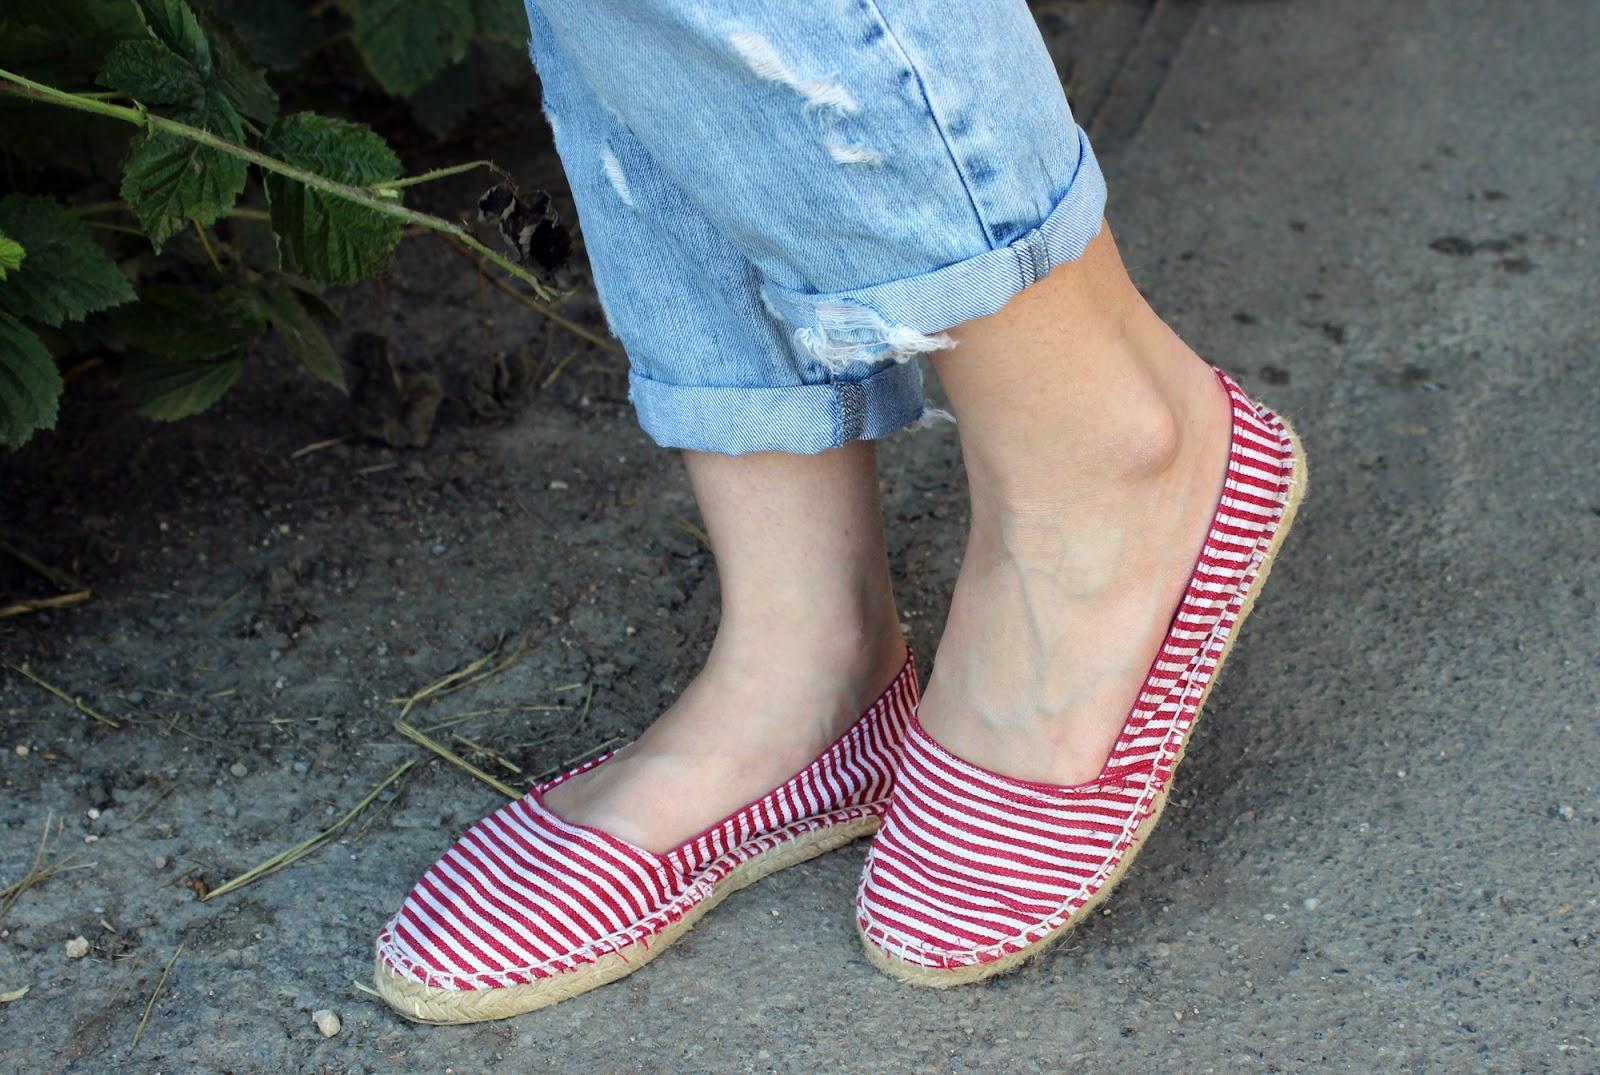 TheBlondeLion Outfit boyfriendjeans stripes Streifen Espadrilles